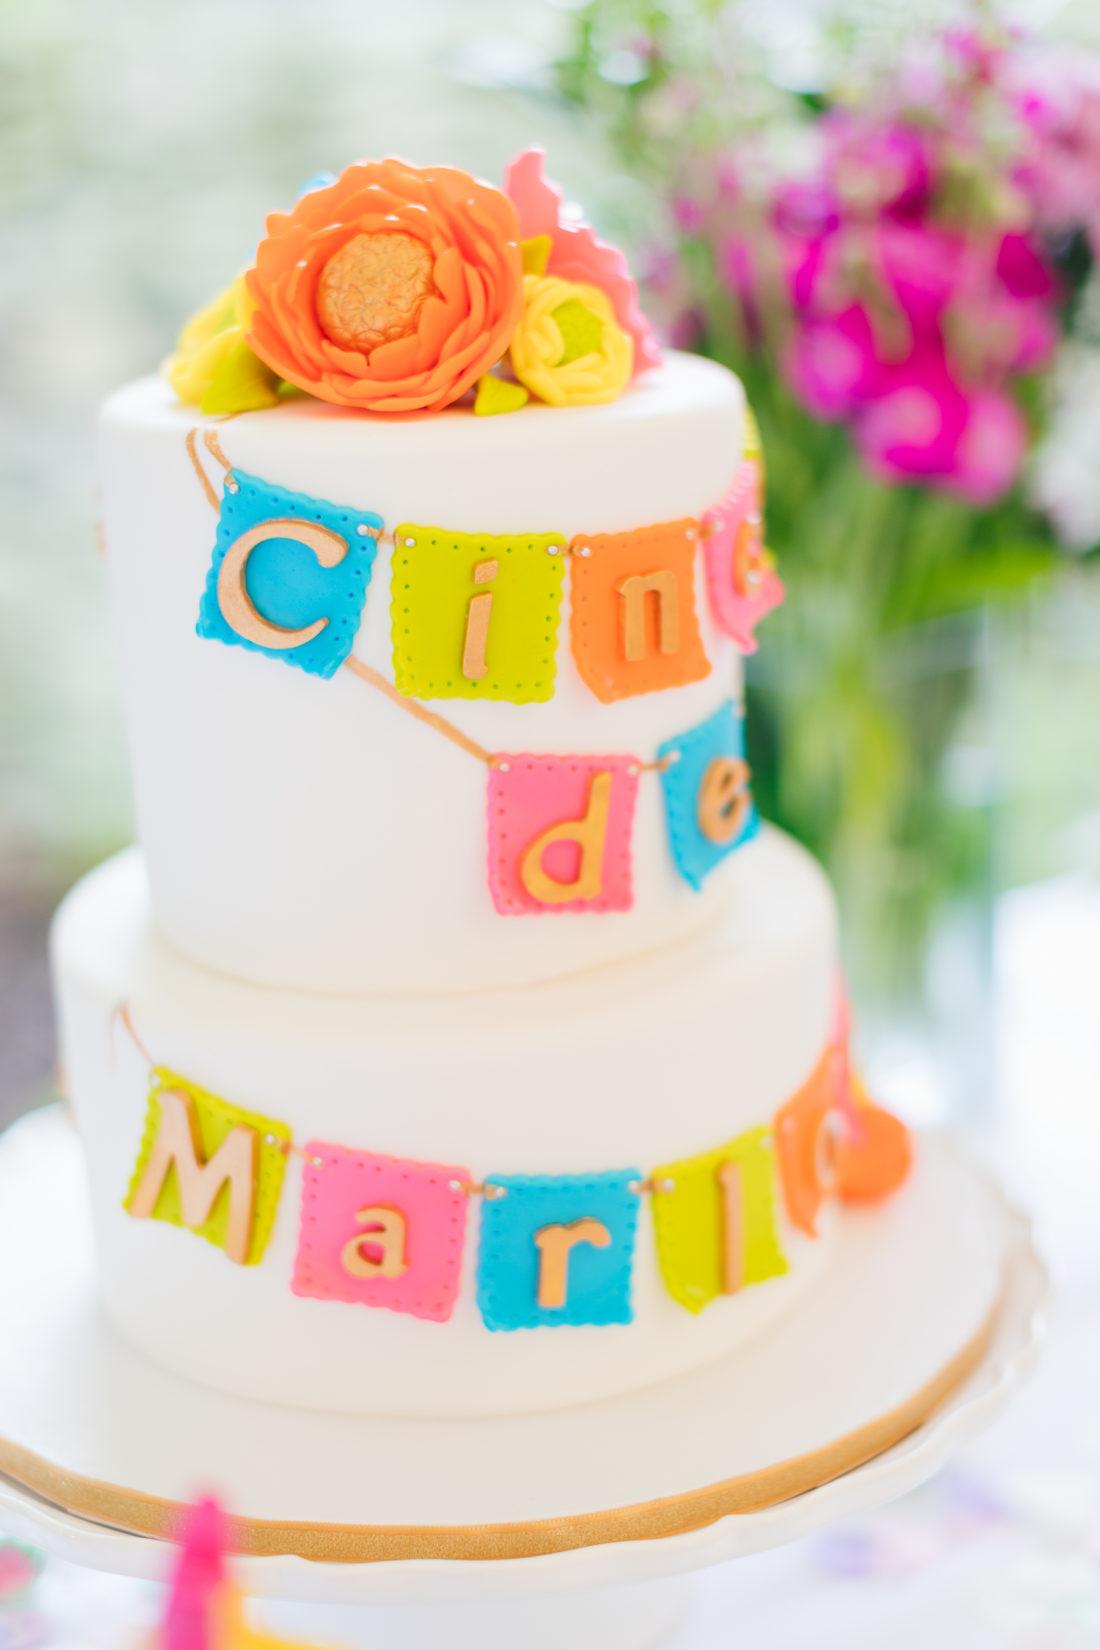 Marlowe Martino's Cinco de Marlowe themed 5th birthday cake